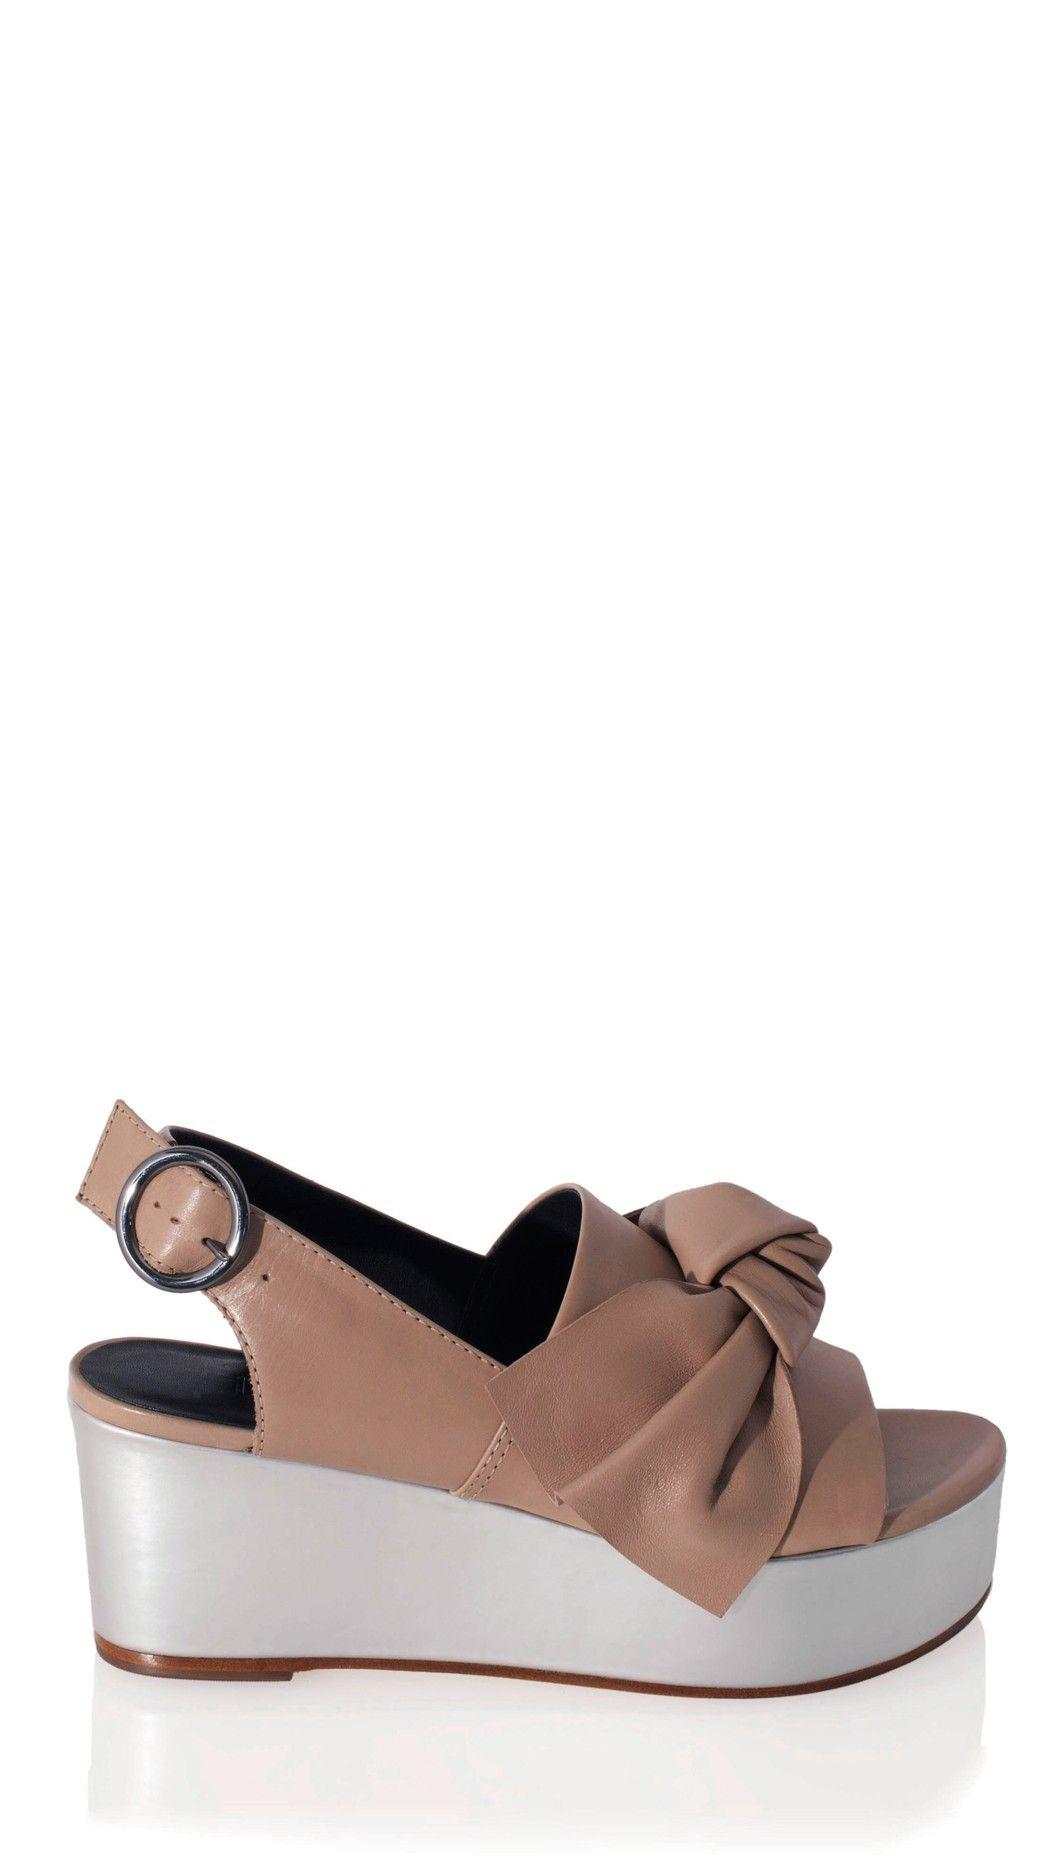 26f680eb5cd0 Tibi - Estel Platform Sandals